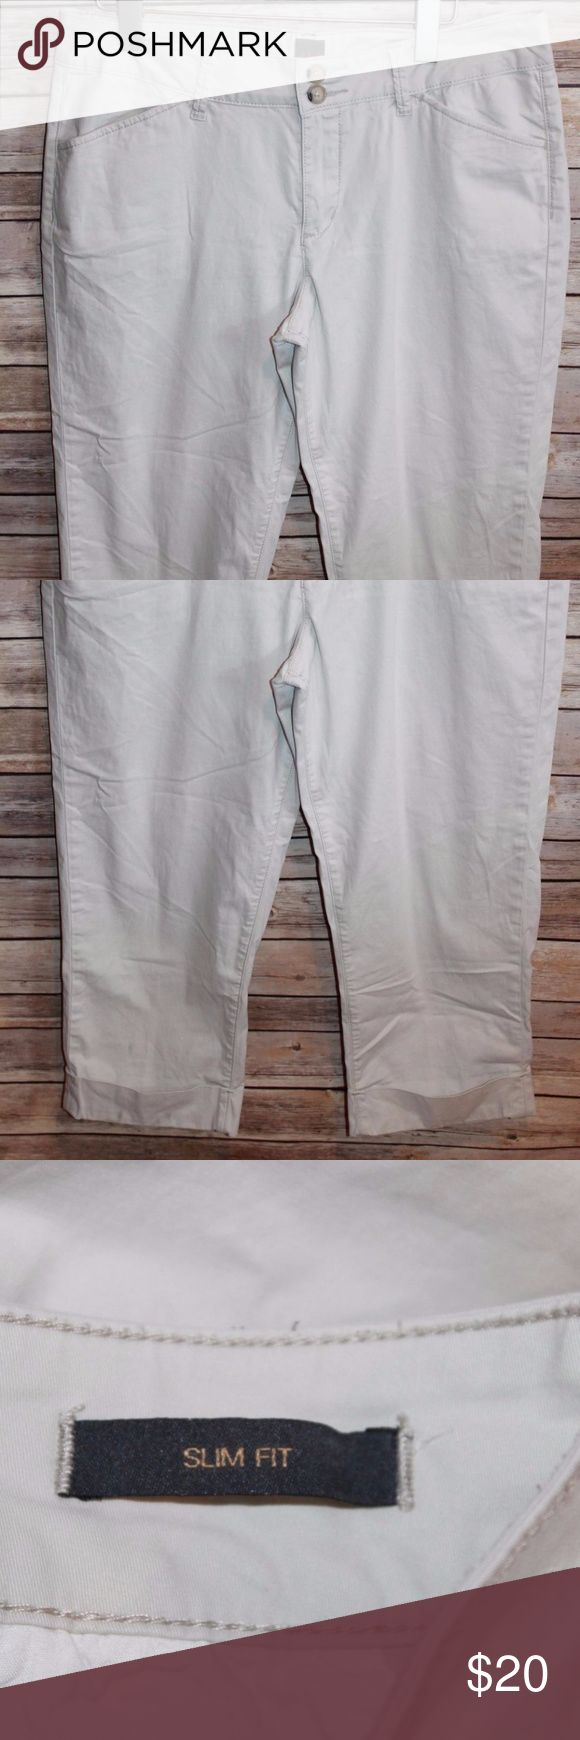 "JAG Slim Fit Khaki Capri Tan Beige Size 16 HW618 JAG Slim Fit Capri Pants  Women's Size: 16 2 Front Pockets 2 Back Pockets  Belt Loops  97% Cotton 3% Spandex  Measurements were taken with garment laying flat and are approximate:  Rise: 10 1/2""  Waist: 34""  Inseam: 23"" Jag Jeans Pants Capris"